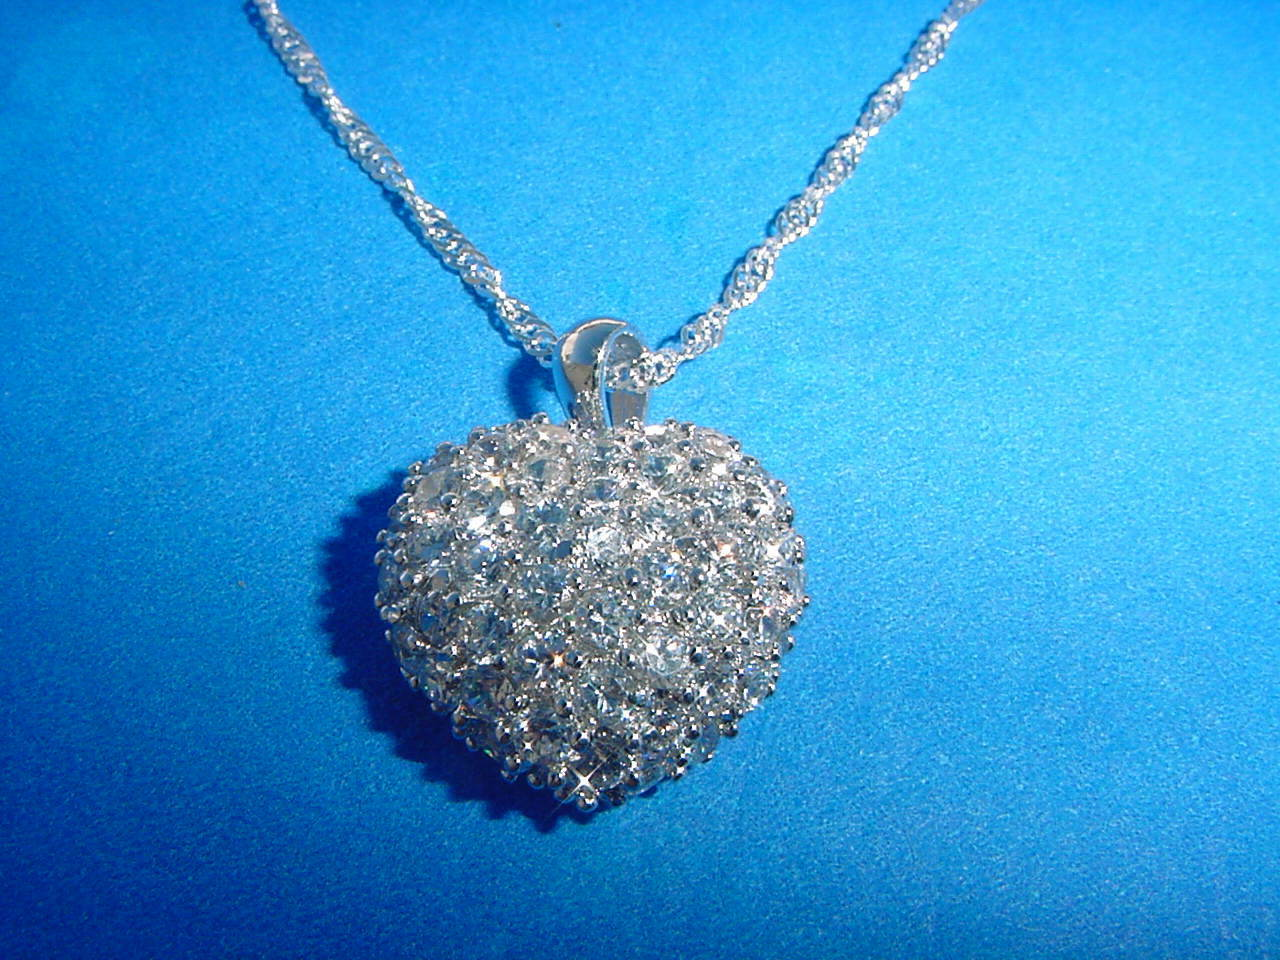 Beautiful Swarovski Crystal Heart Pendant with Chain